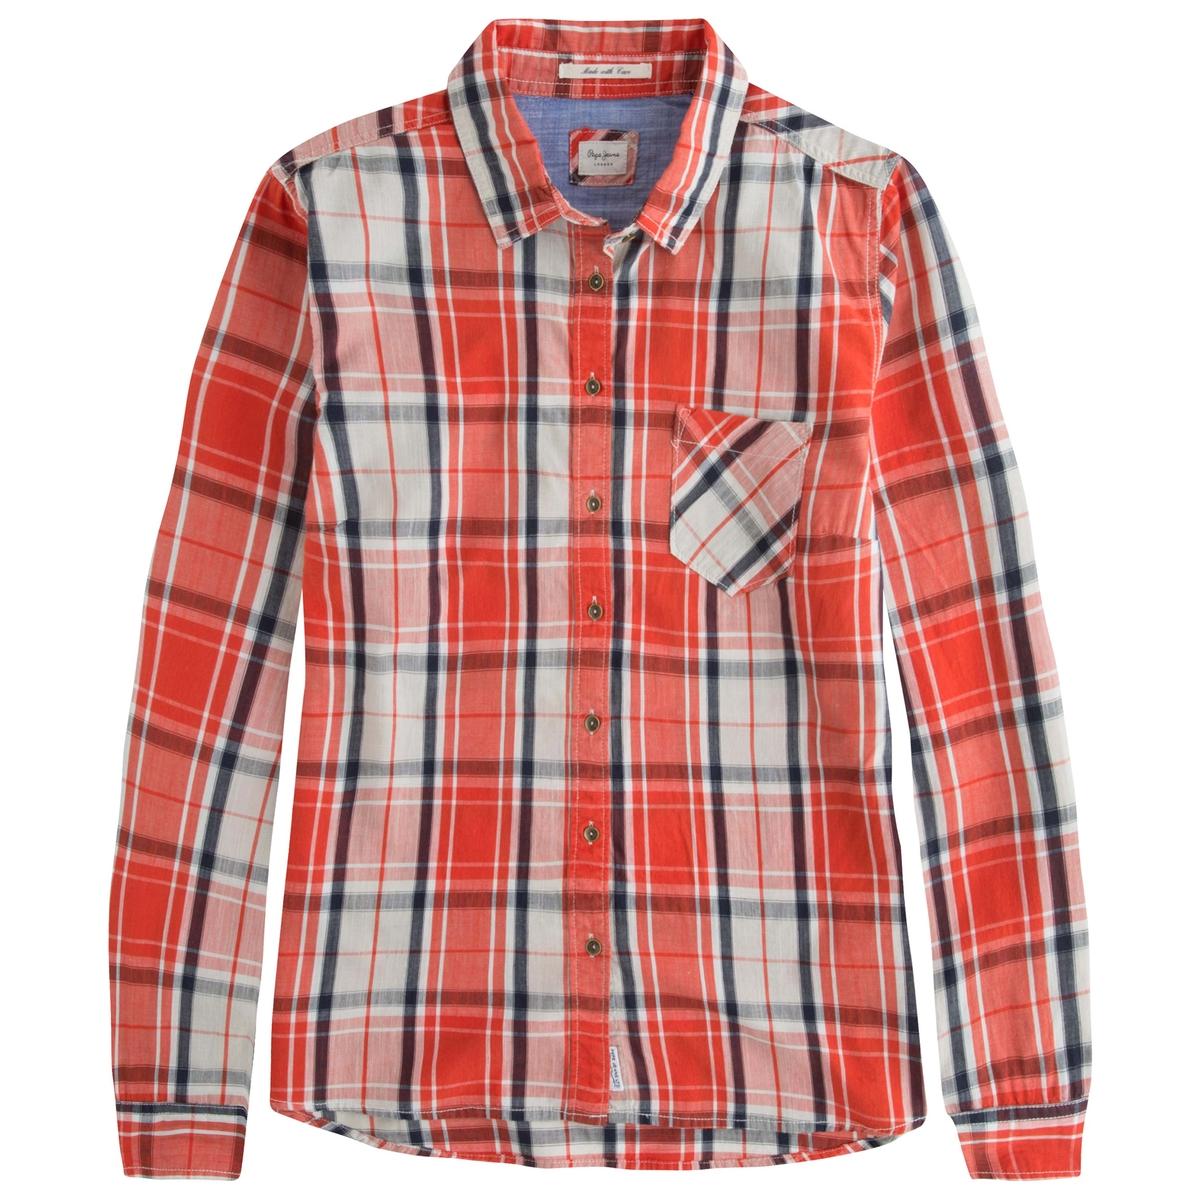 Рубашка в клетку с карманом MALENEСостав и описаниеМарка: PEPE JEANS.Модель: MALENE.Материалы: 74% хлопка, 24% полиамида, 2% эластана.<br><br>Цвет: в клетку<br>Размер: L